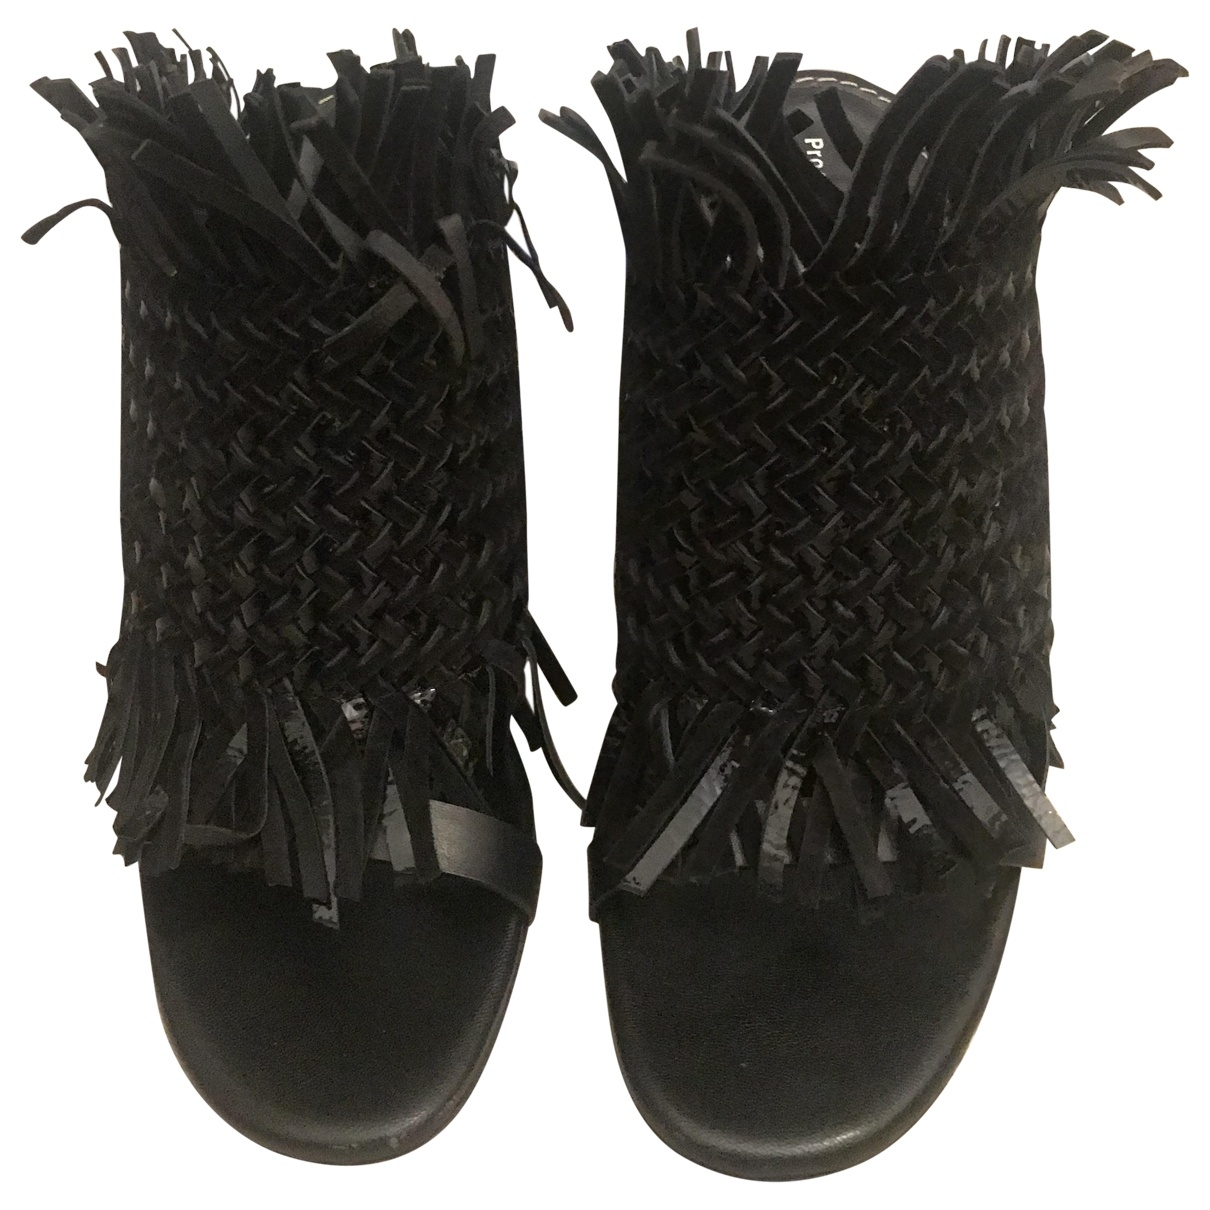 Proenza Schouler \N Black Leather Sandals for Women 38.5 EU